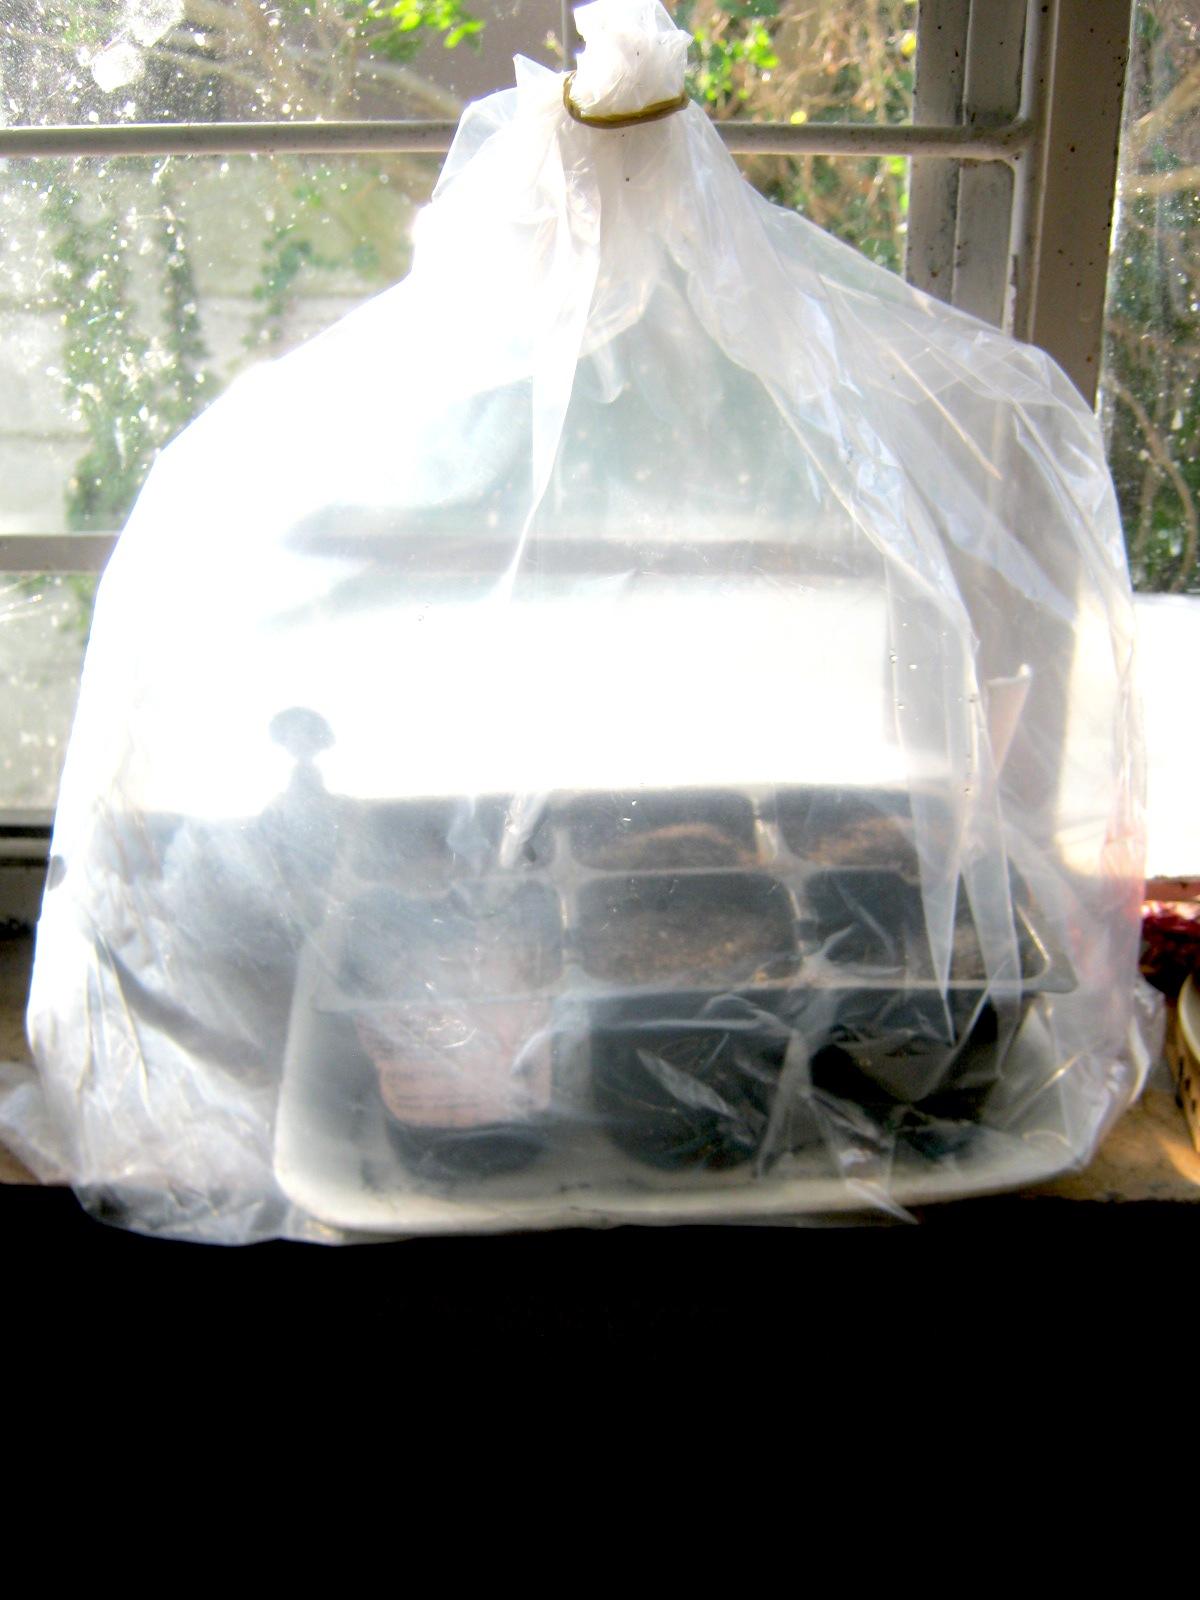 Carolina Reaper seeds in a plastic bag on window sill